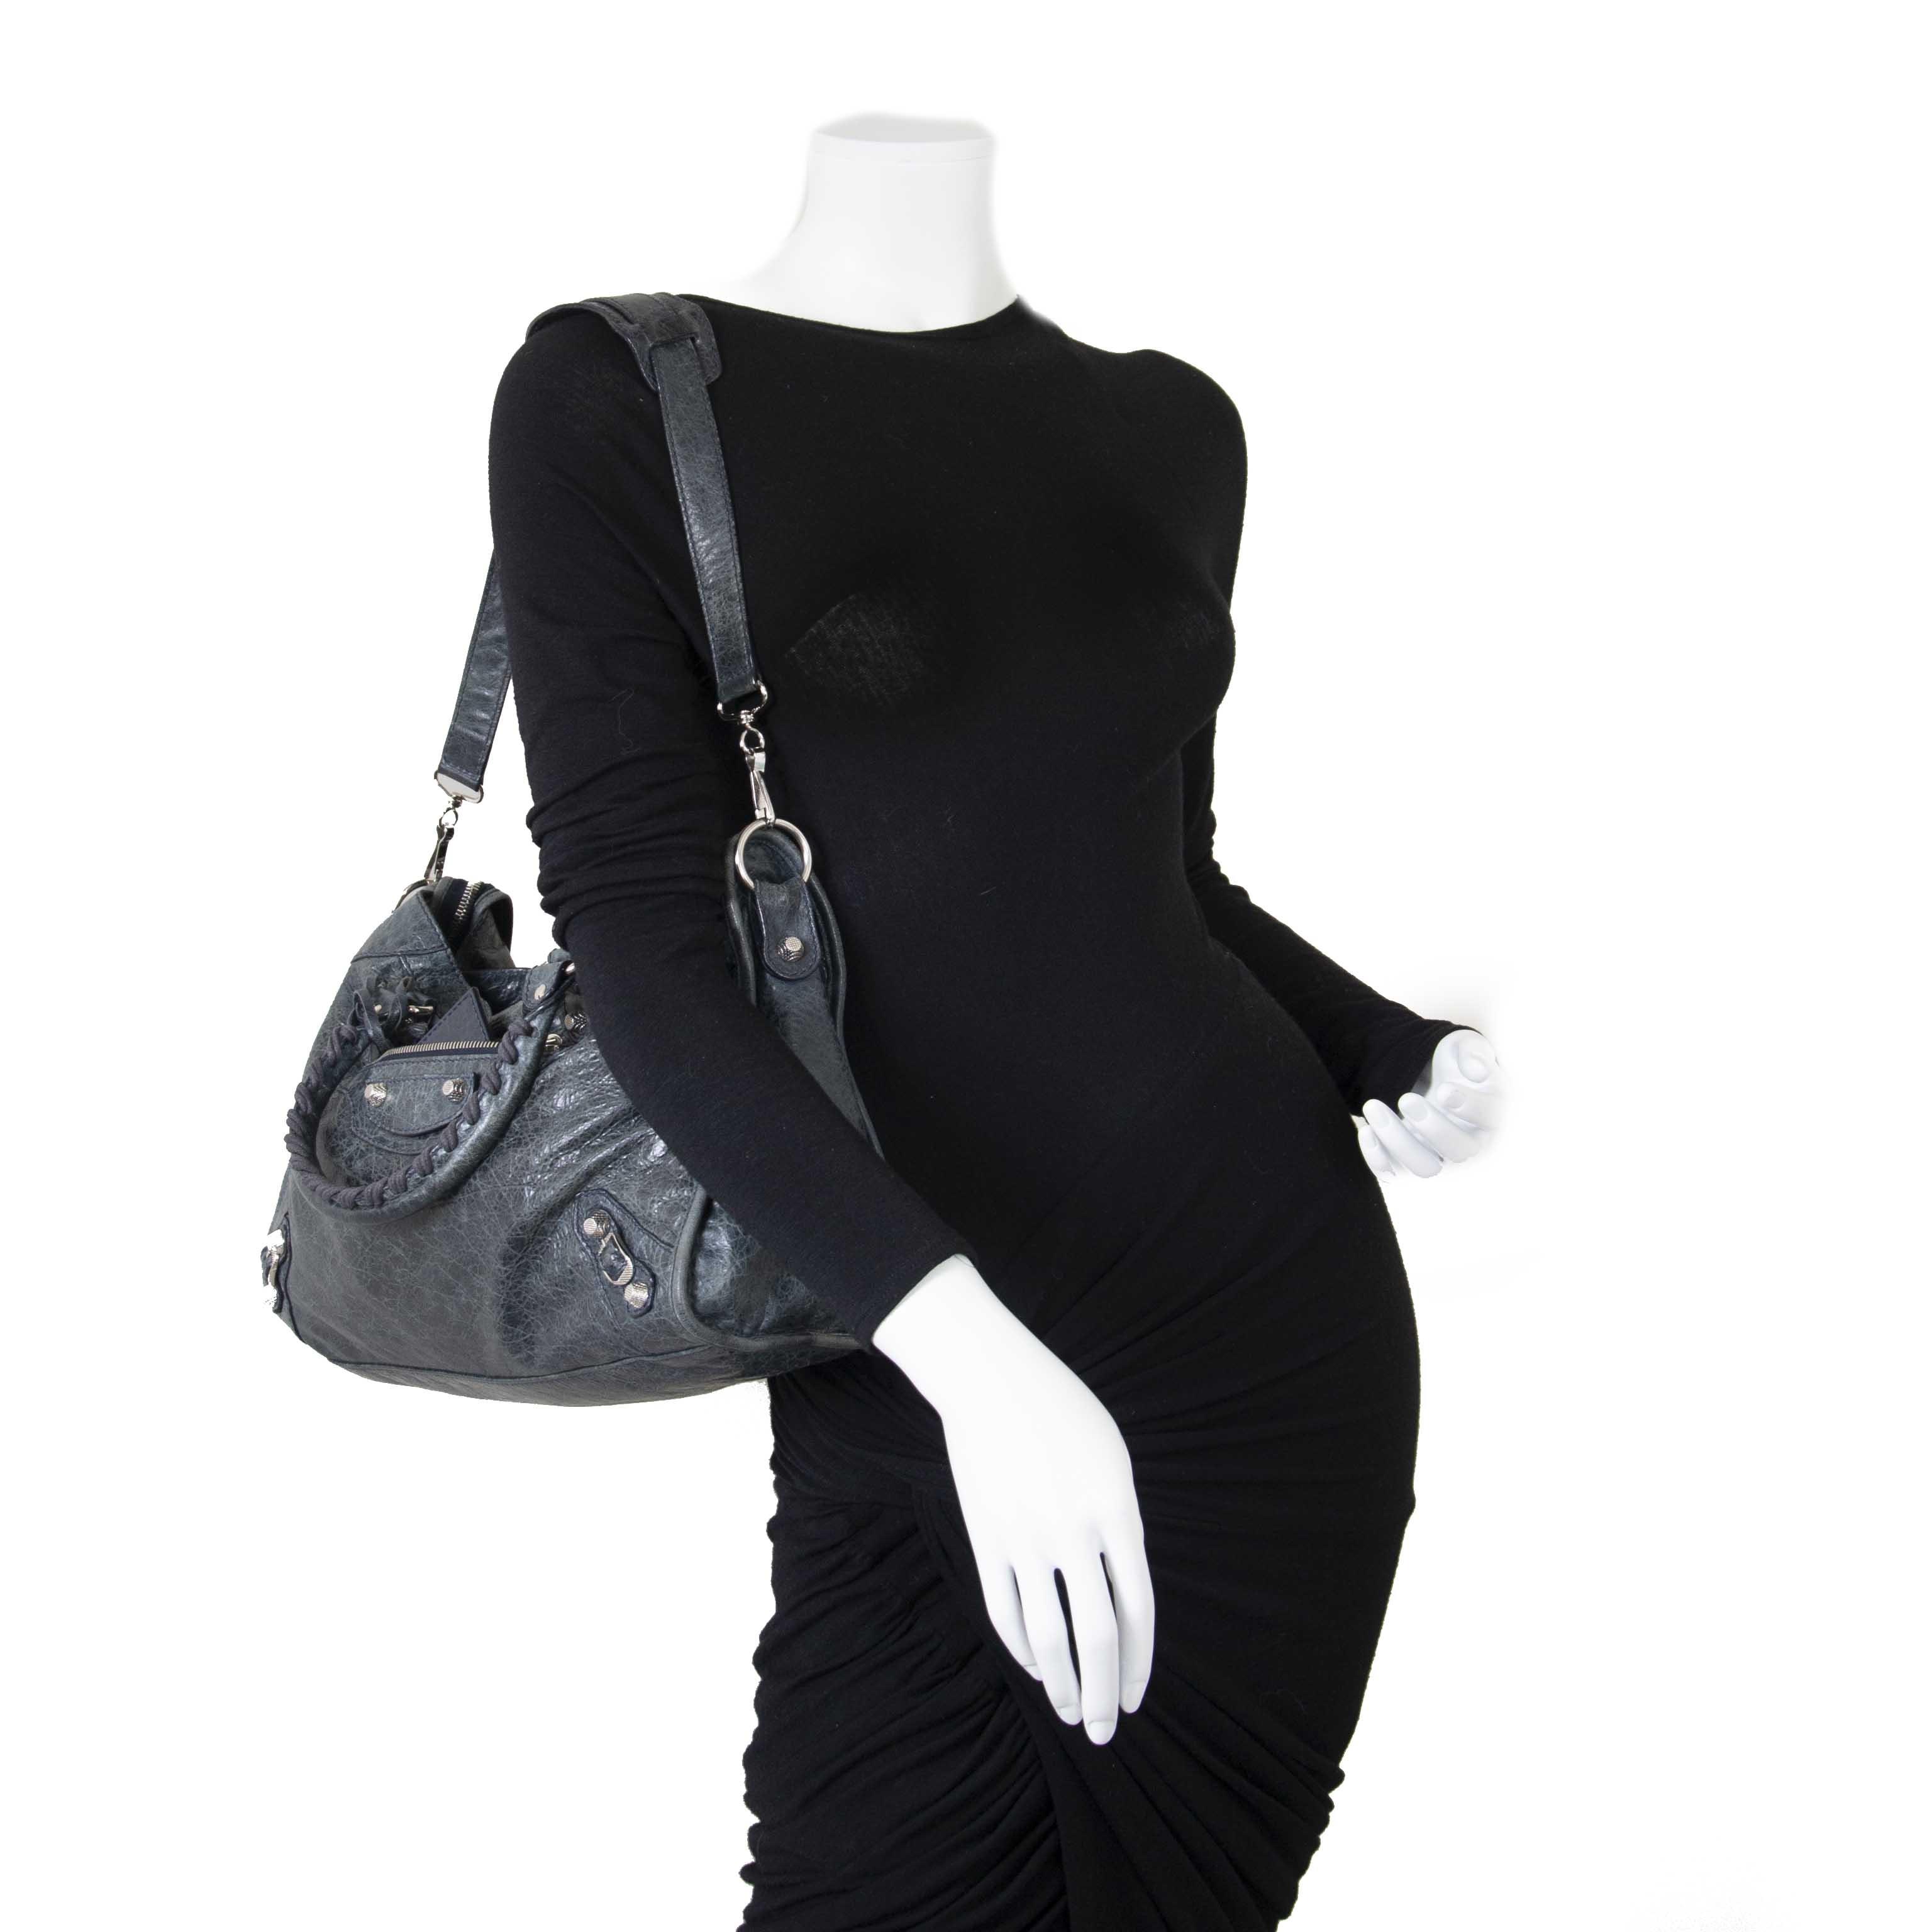 779f4214859b1 ... Balenciaga Agneau Giant 12 City Dark Knight now for sale at labellov  vintage fashion webshop belgium